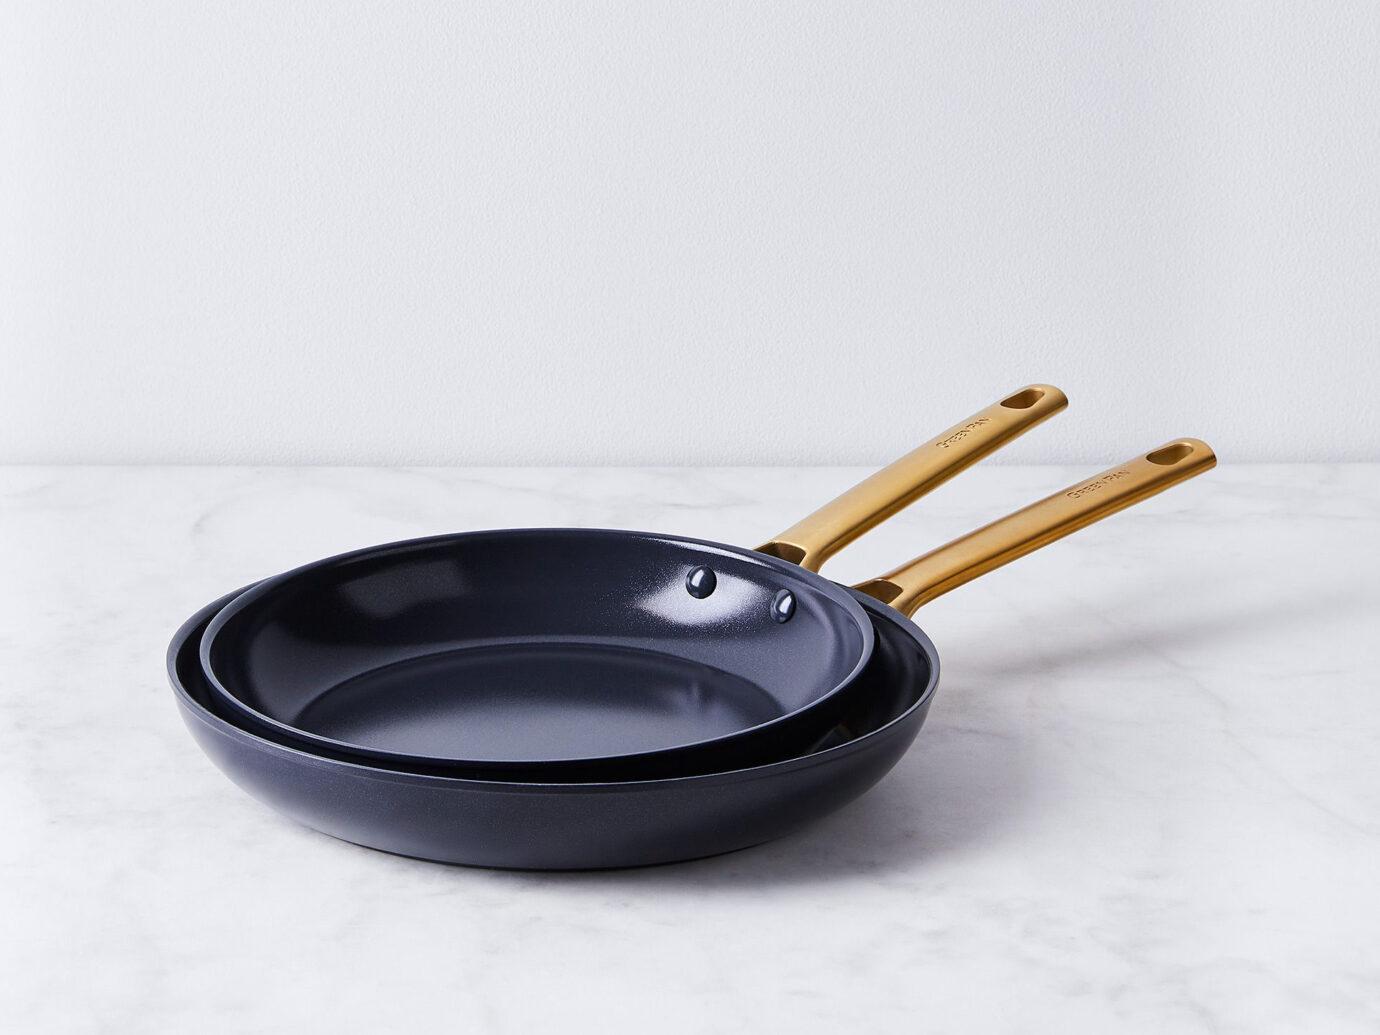 GreenPan Reserve Nonstick Fry Pan